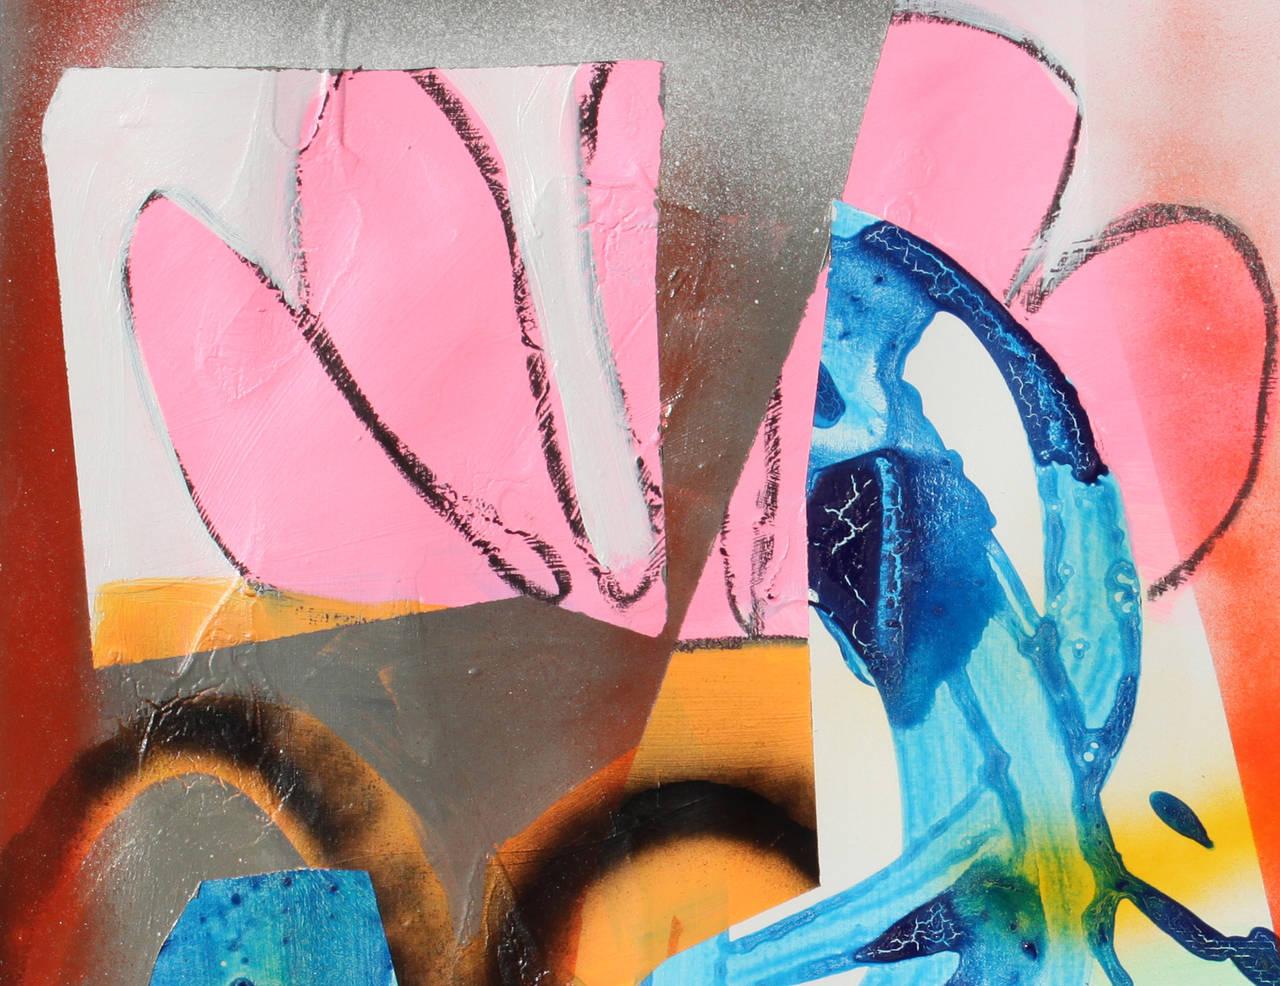 Untitled No 14 - Contemporary Art by Fiona Ackerman